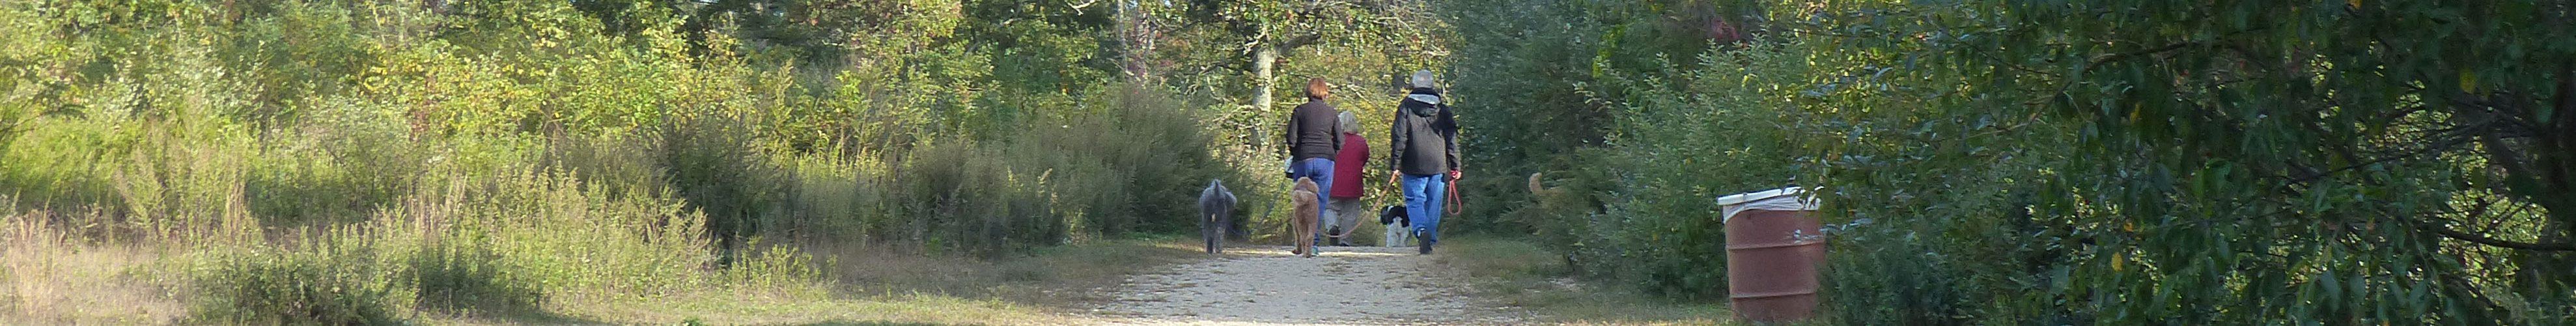 Springs Dog Park